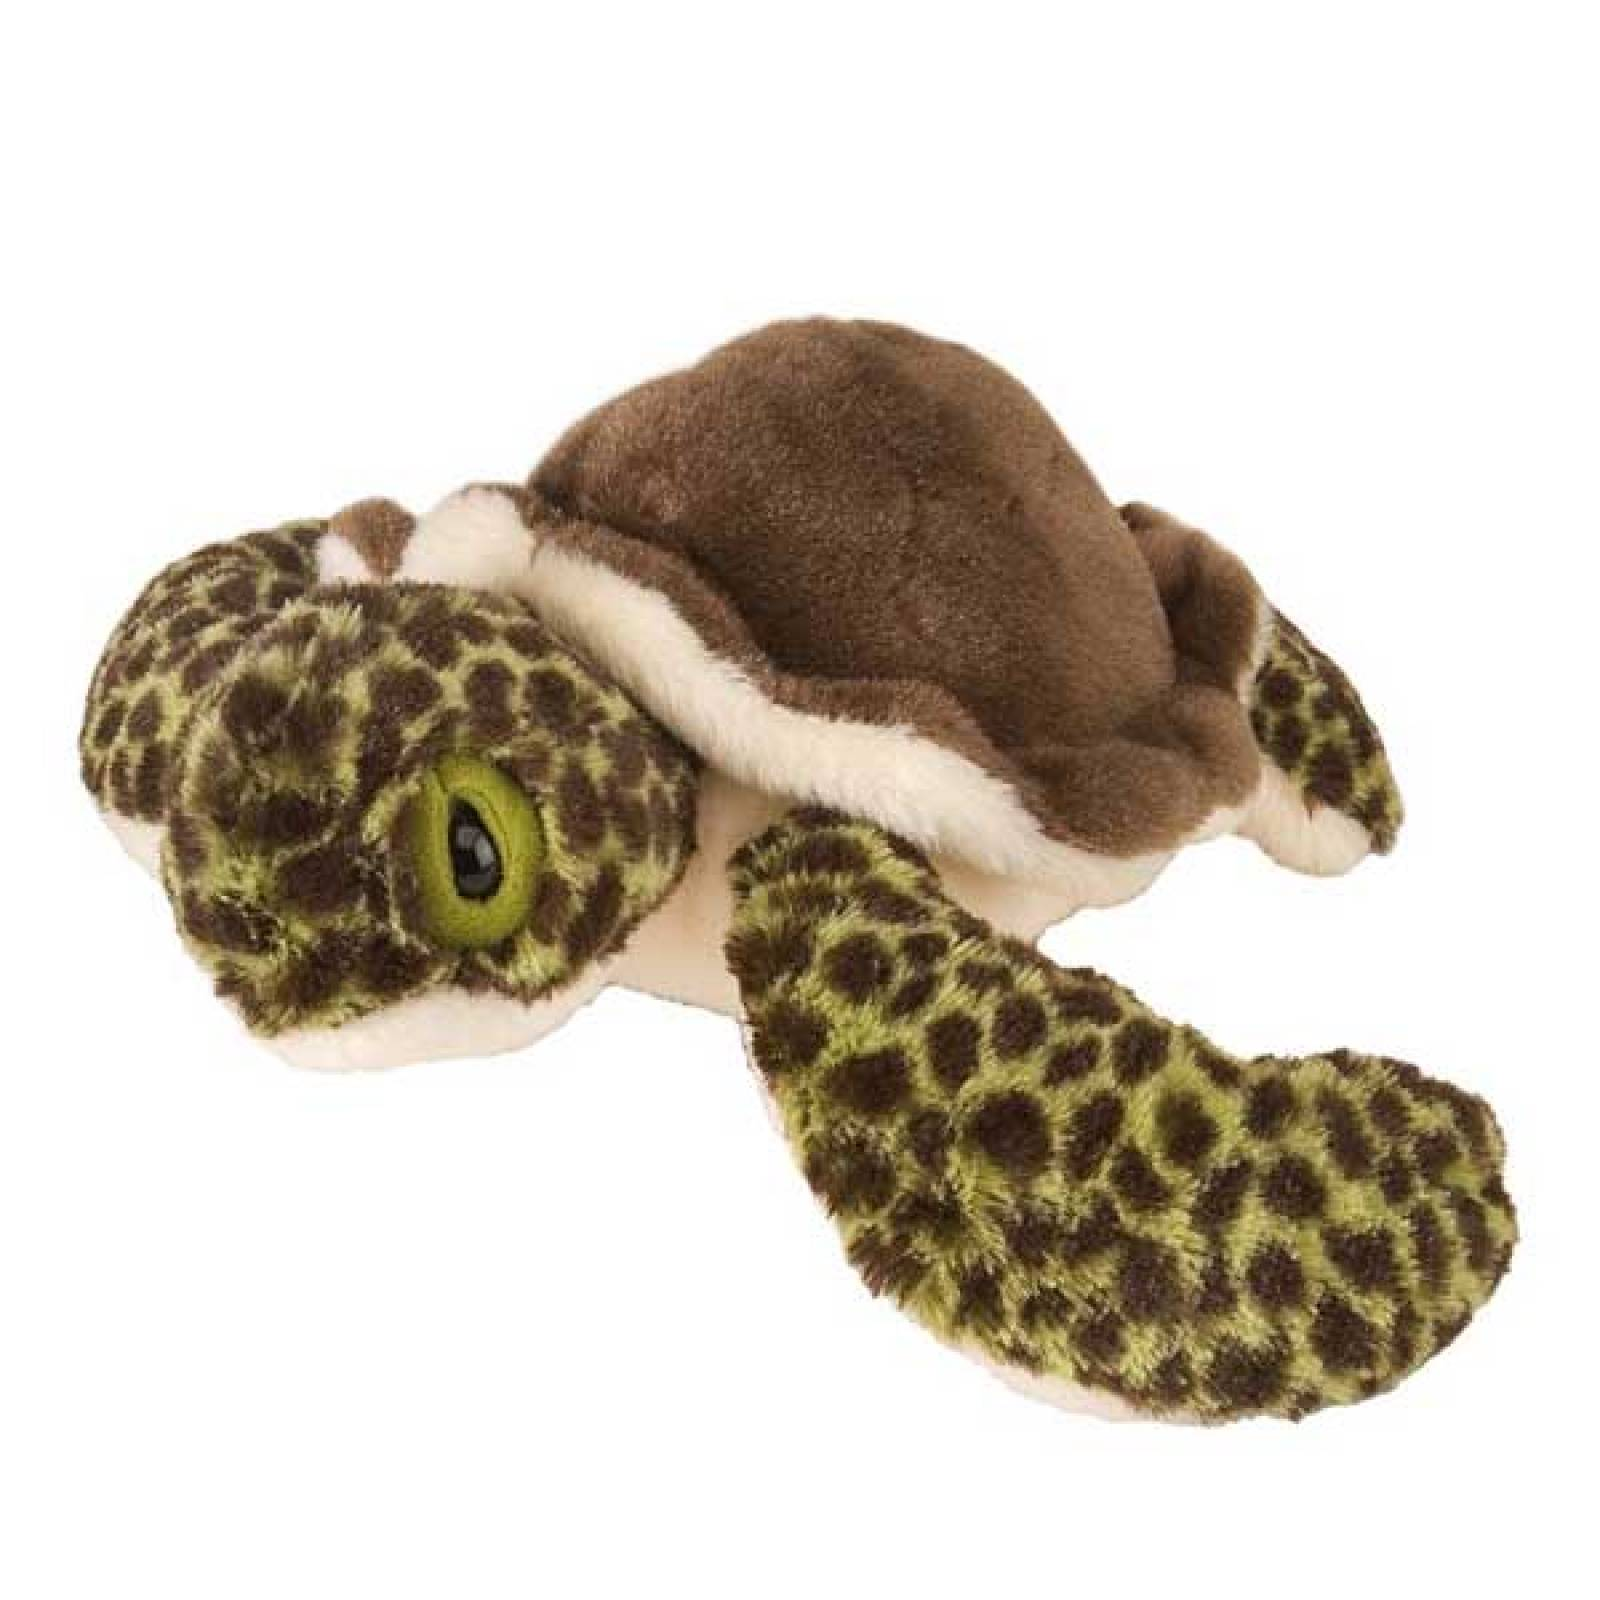 Mini Baby Sea Turtle Soft Toy 22cm